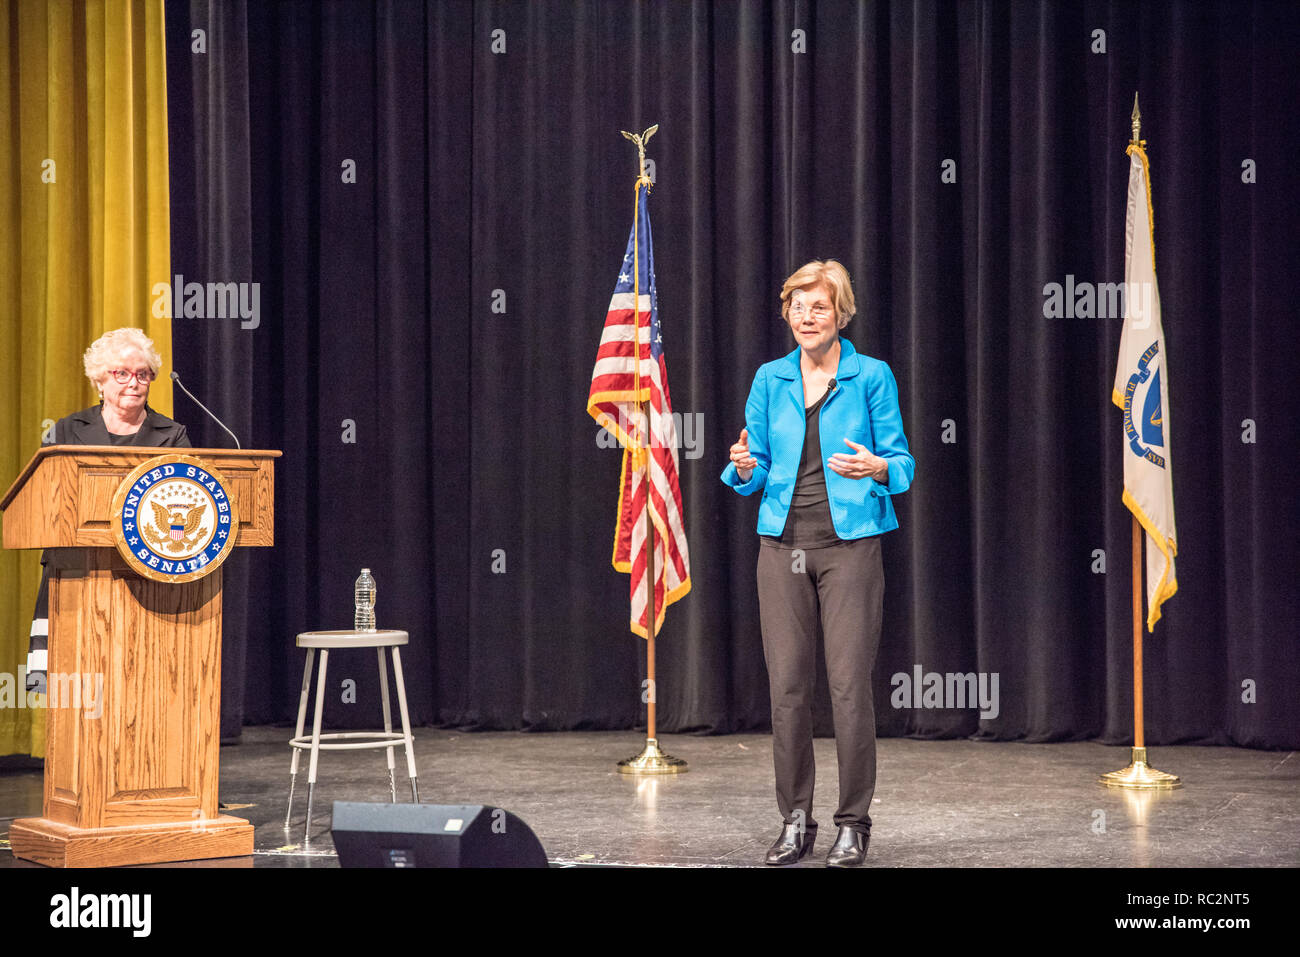 U.S. Senator Elizabeth Warren on stage with Massachusetts Representative Cory Atkins. - Stock Image